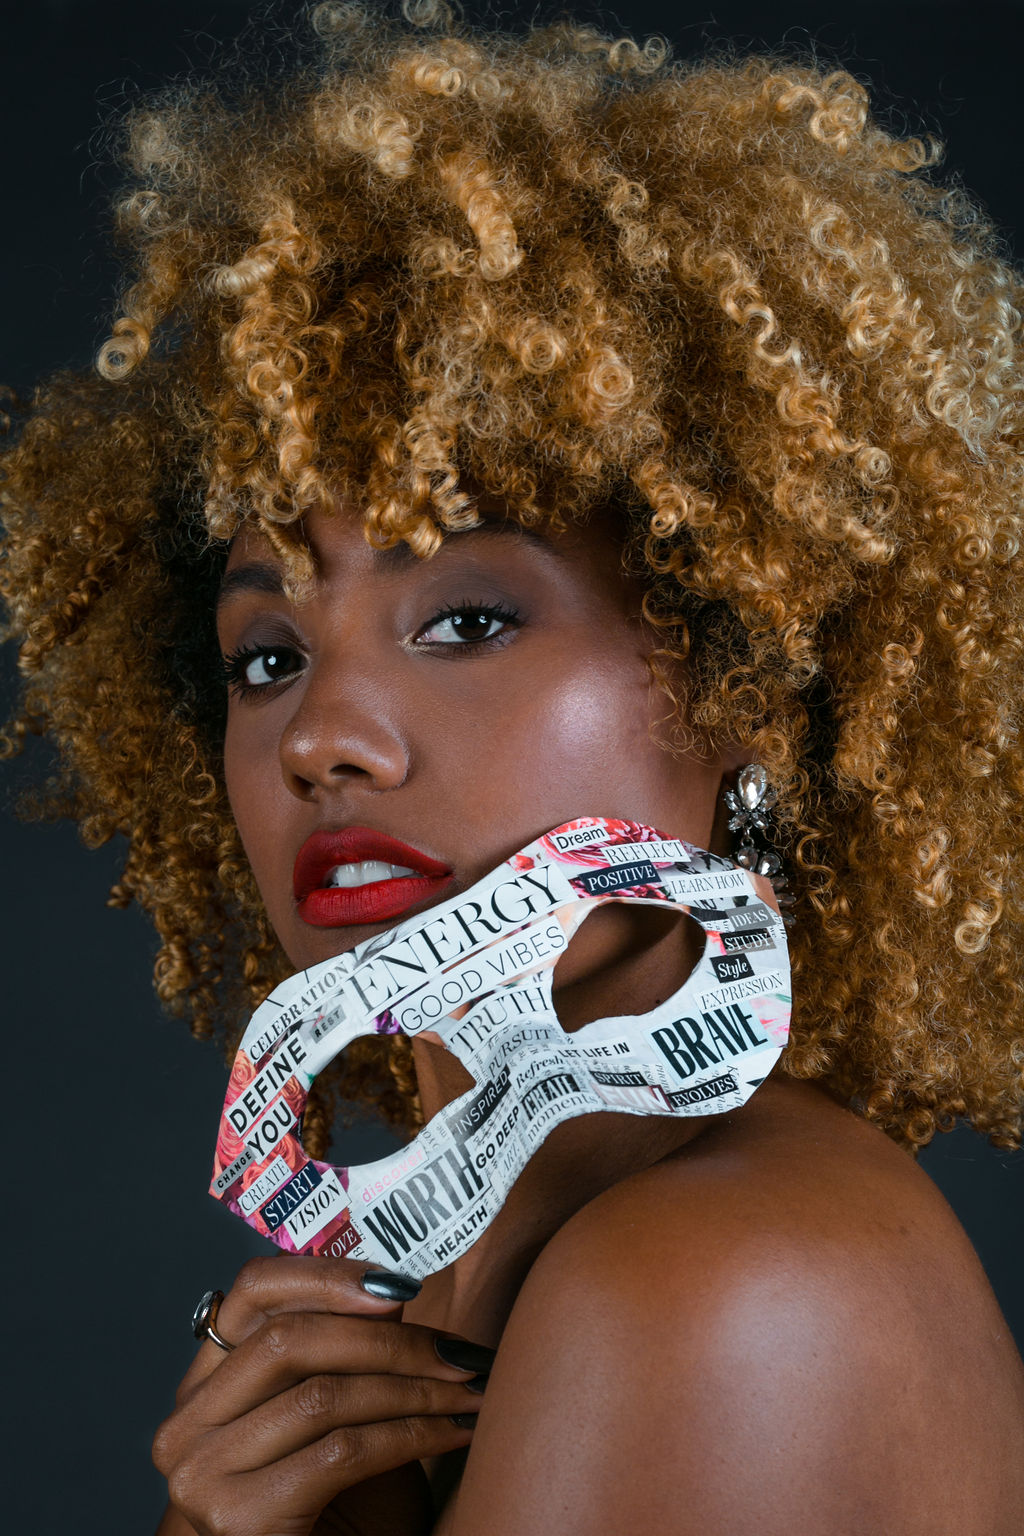 masquerade-mask-RSEEXLCM-BirthdayShoot-xmmtt-wearwhoyouare-6550-shoot